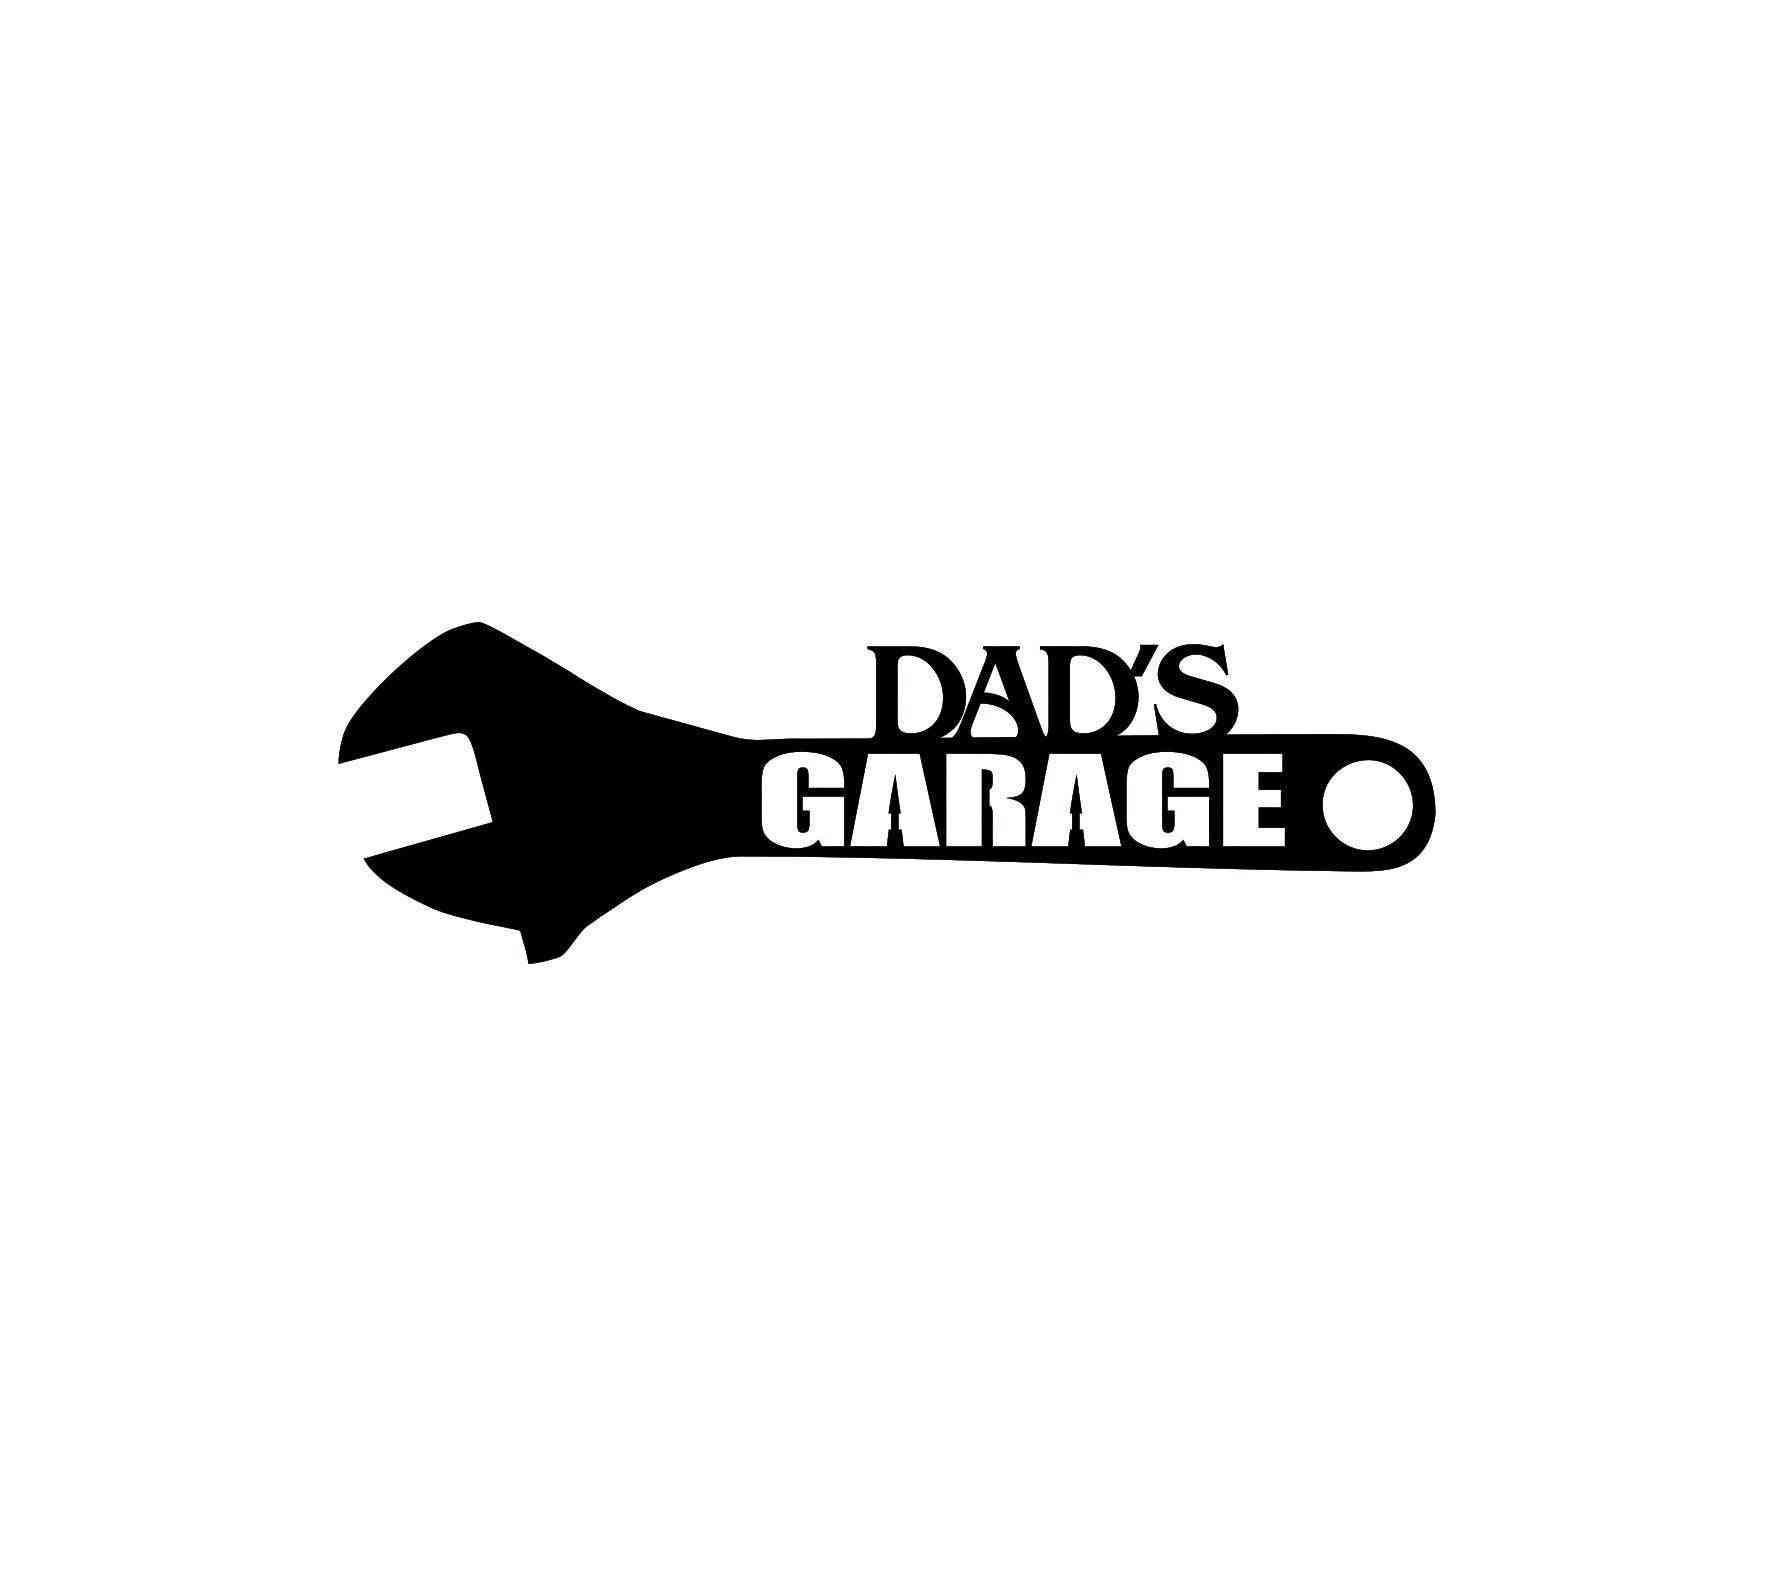 Dad's Garage - Metal Sign